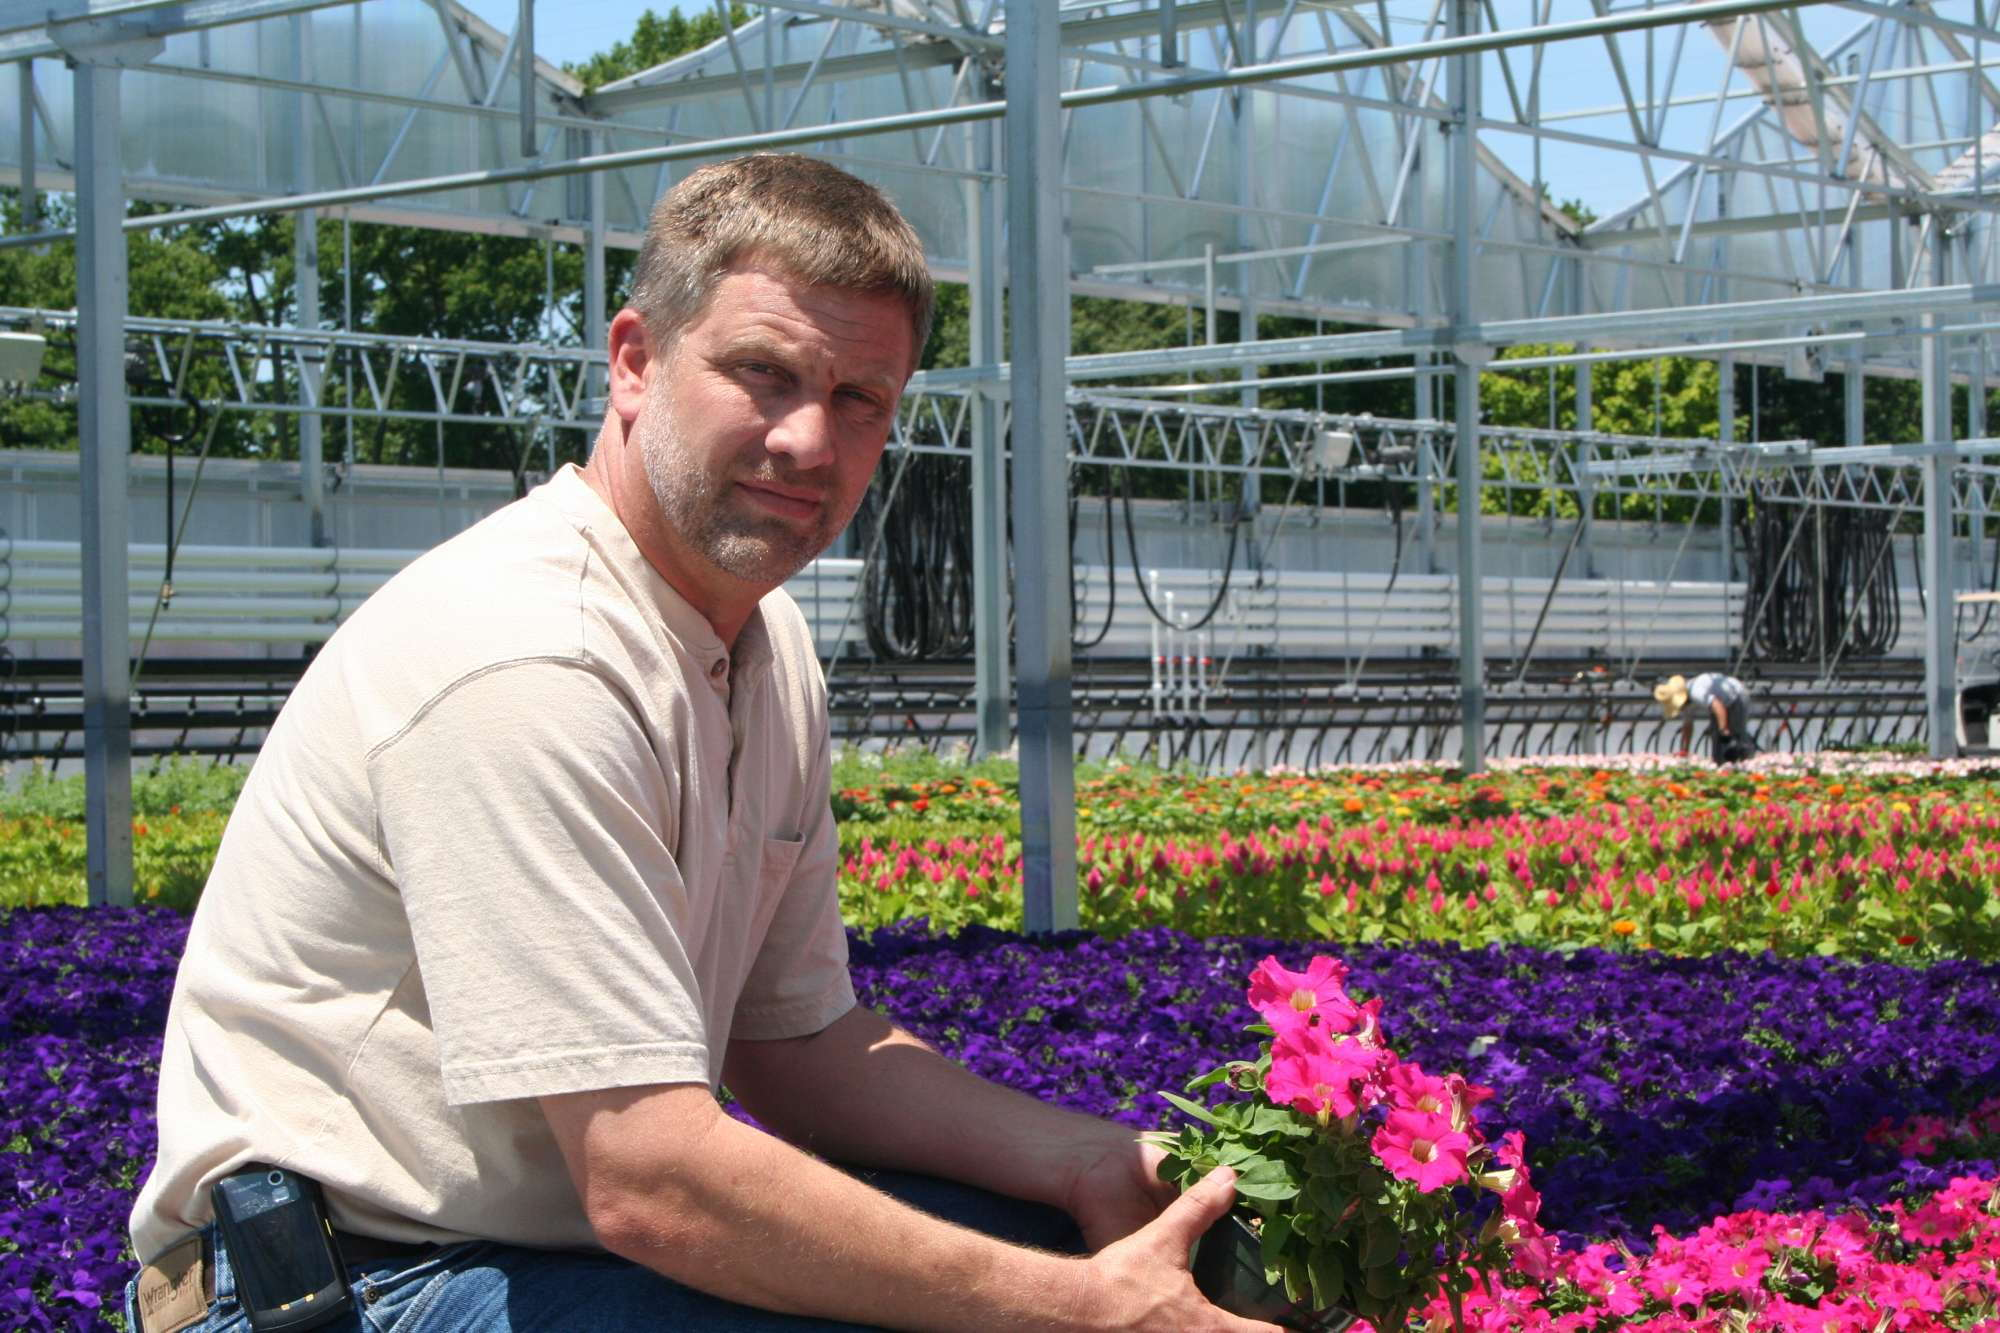 Head Grower Of The Year Joe Moore: The Best Growers Lead By Example